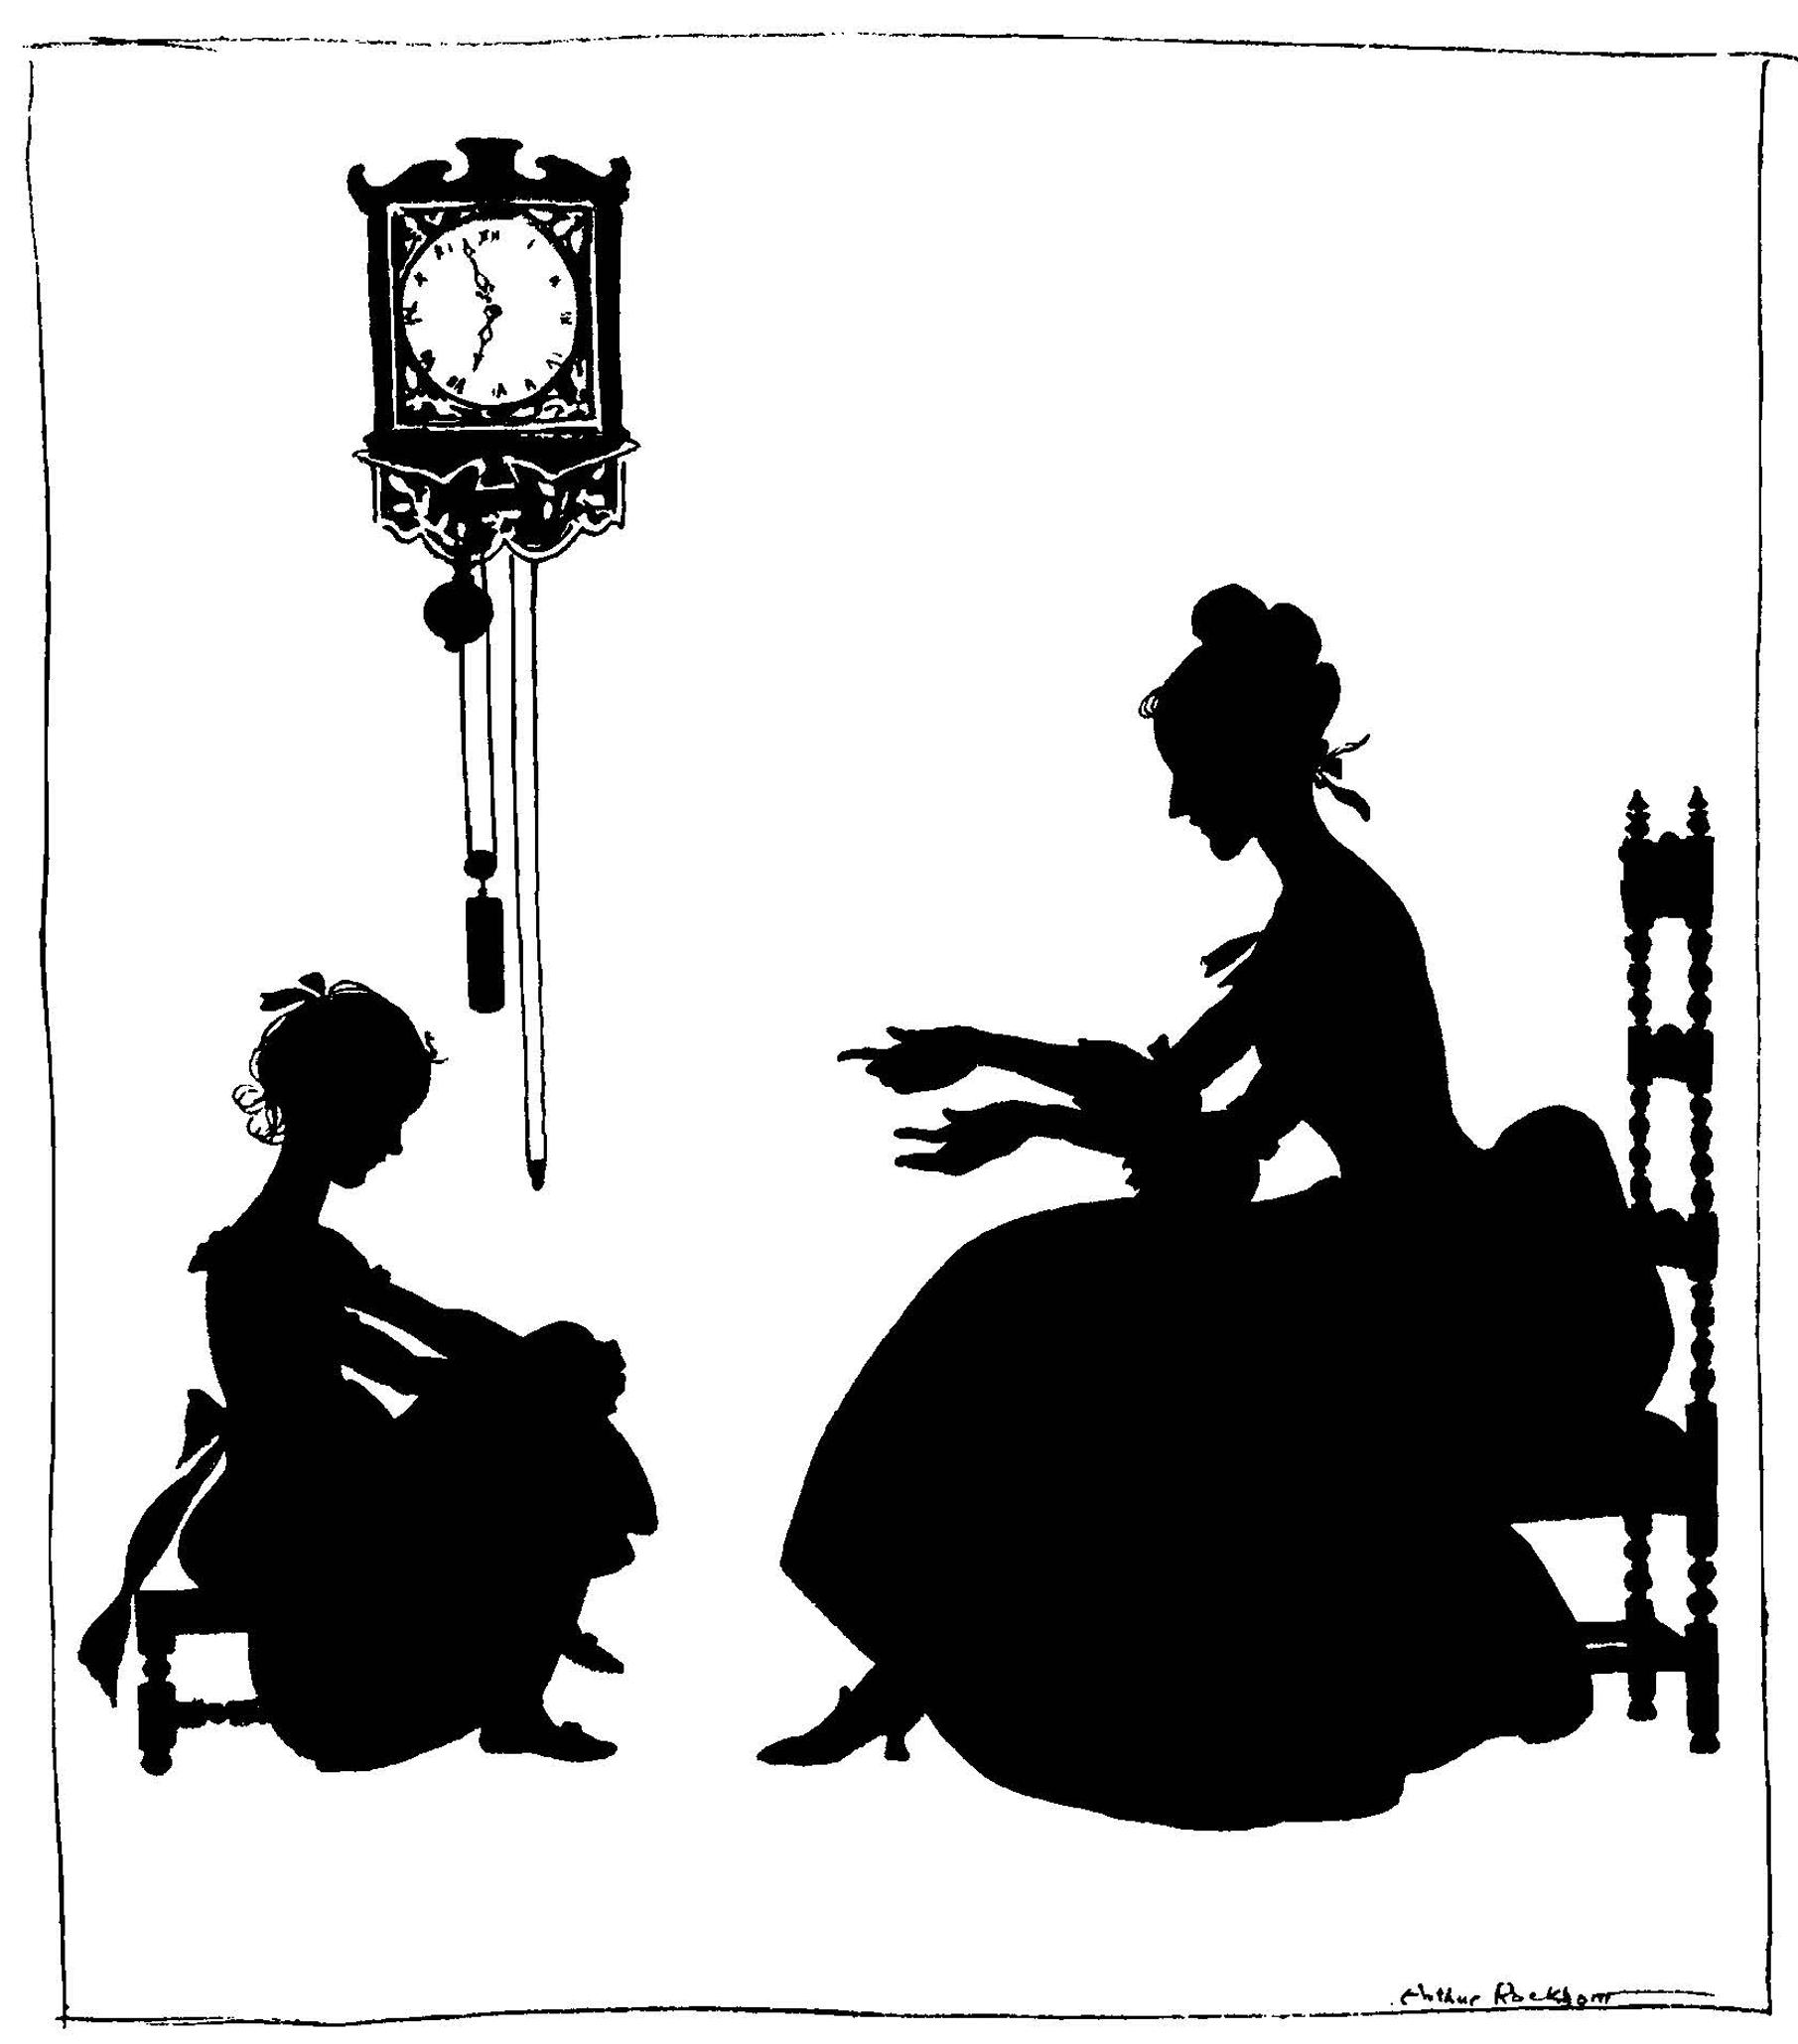 9781447477983_Cinderella Silhouettes